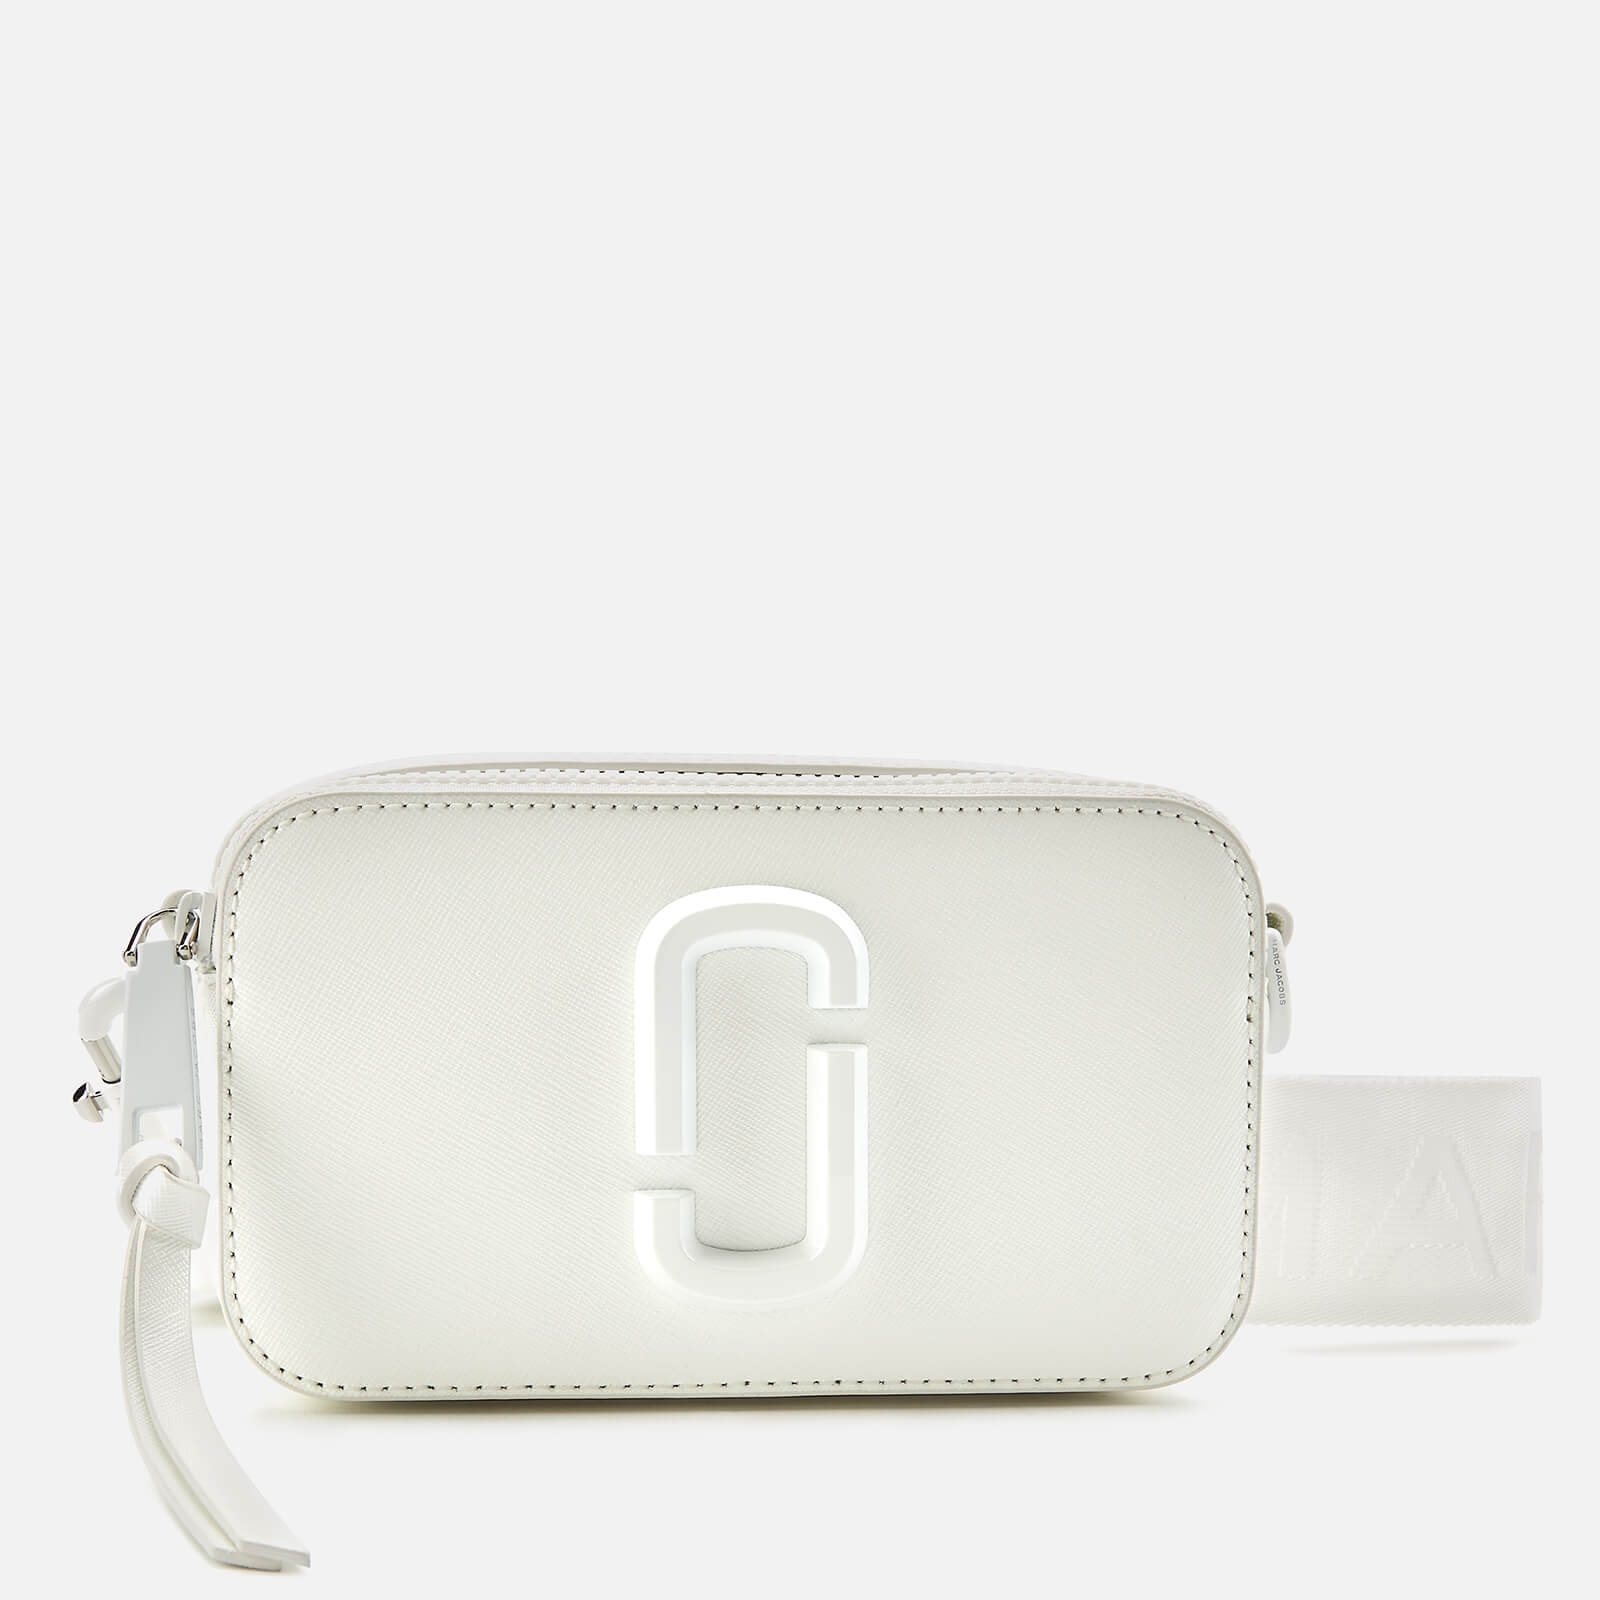 Marc Jacobs Women's Snapshot DTM Bag - Moon White